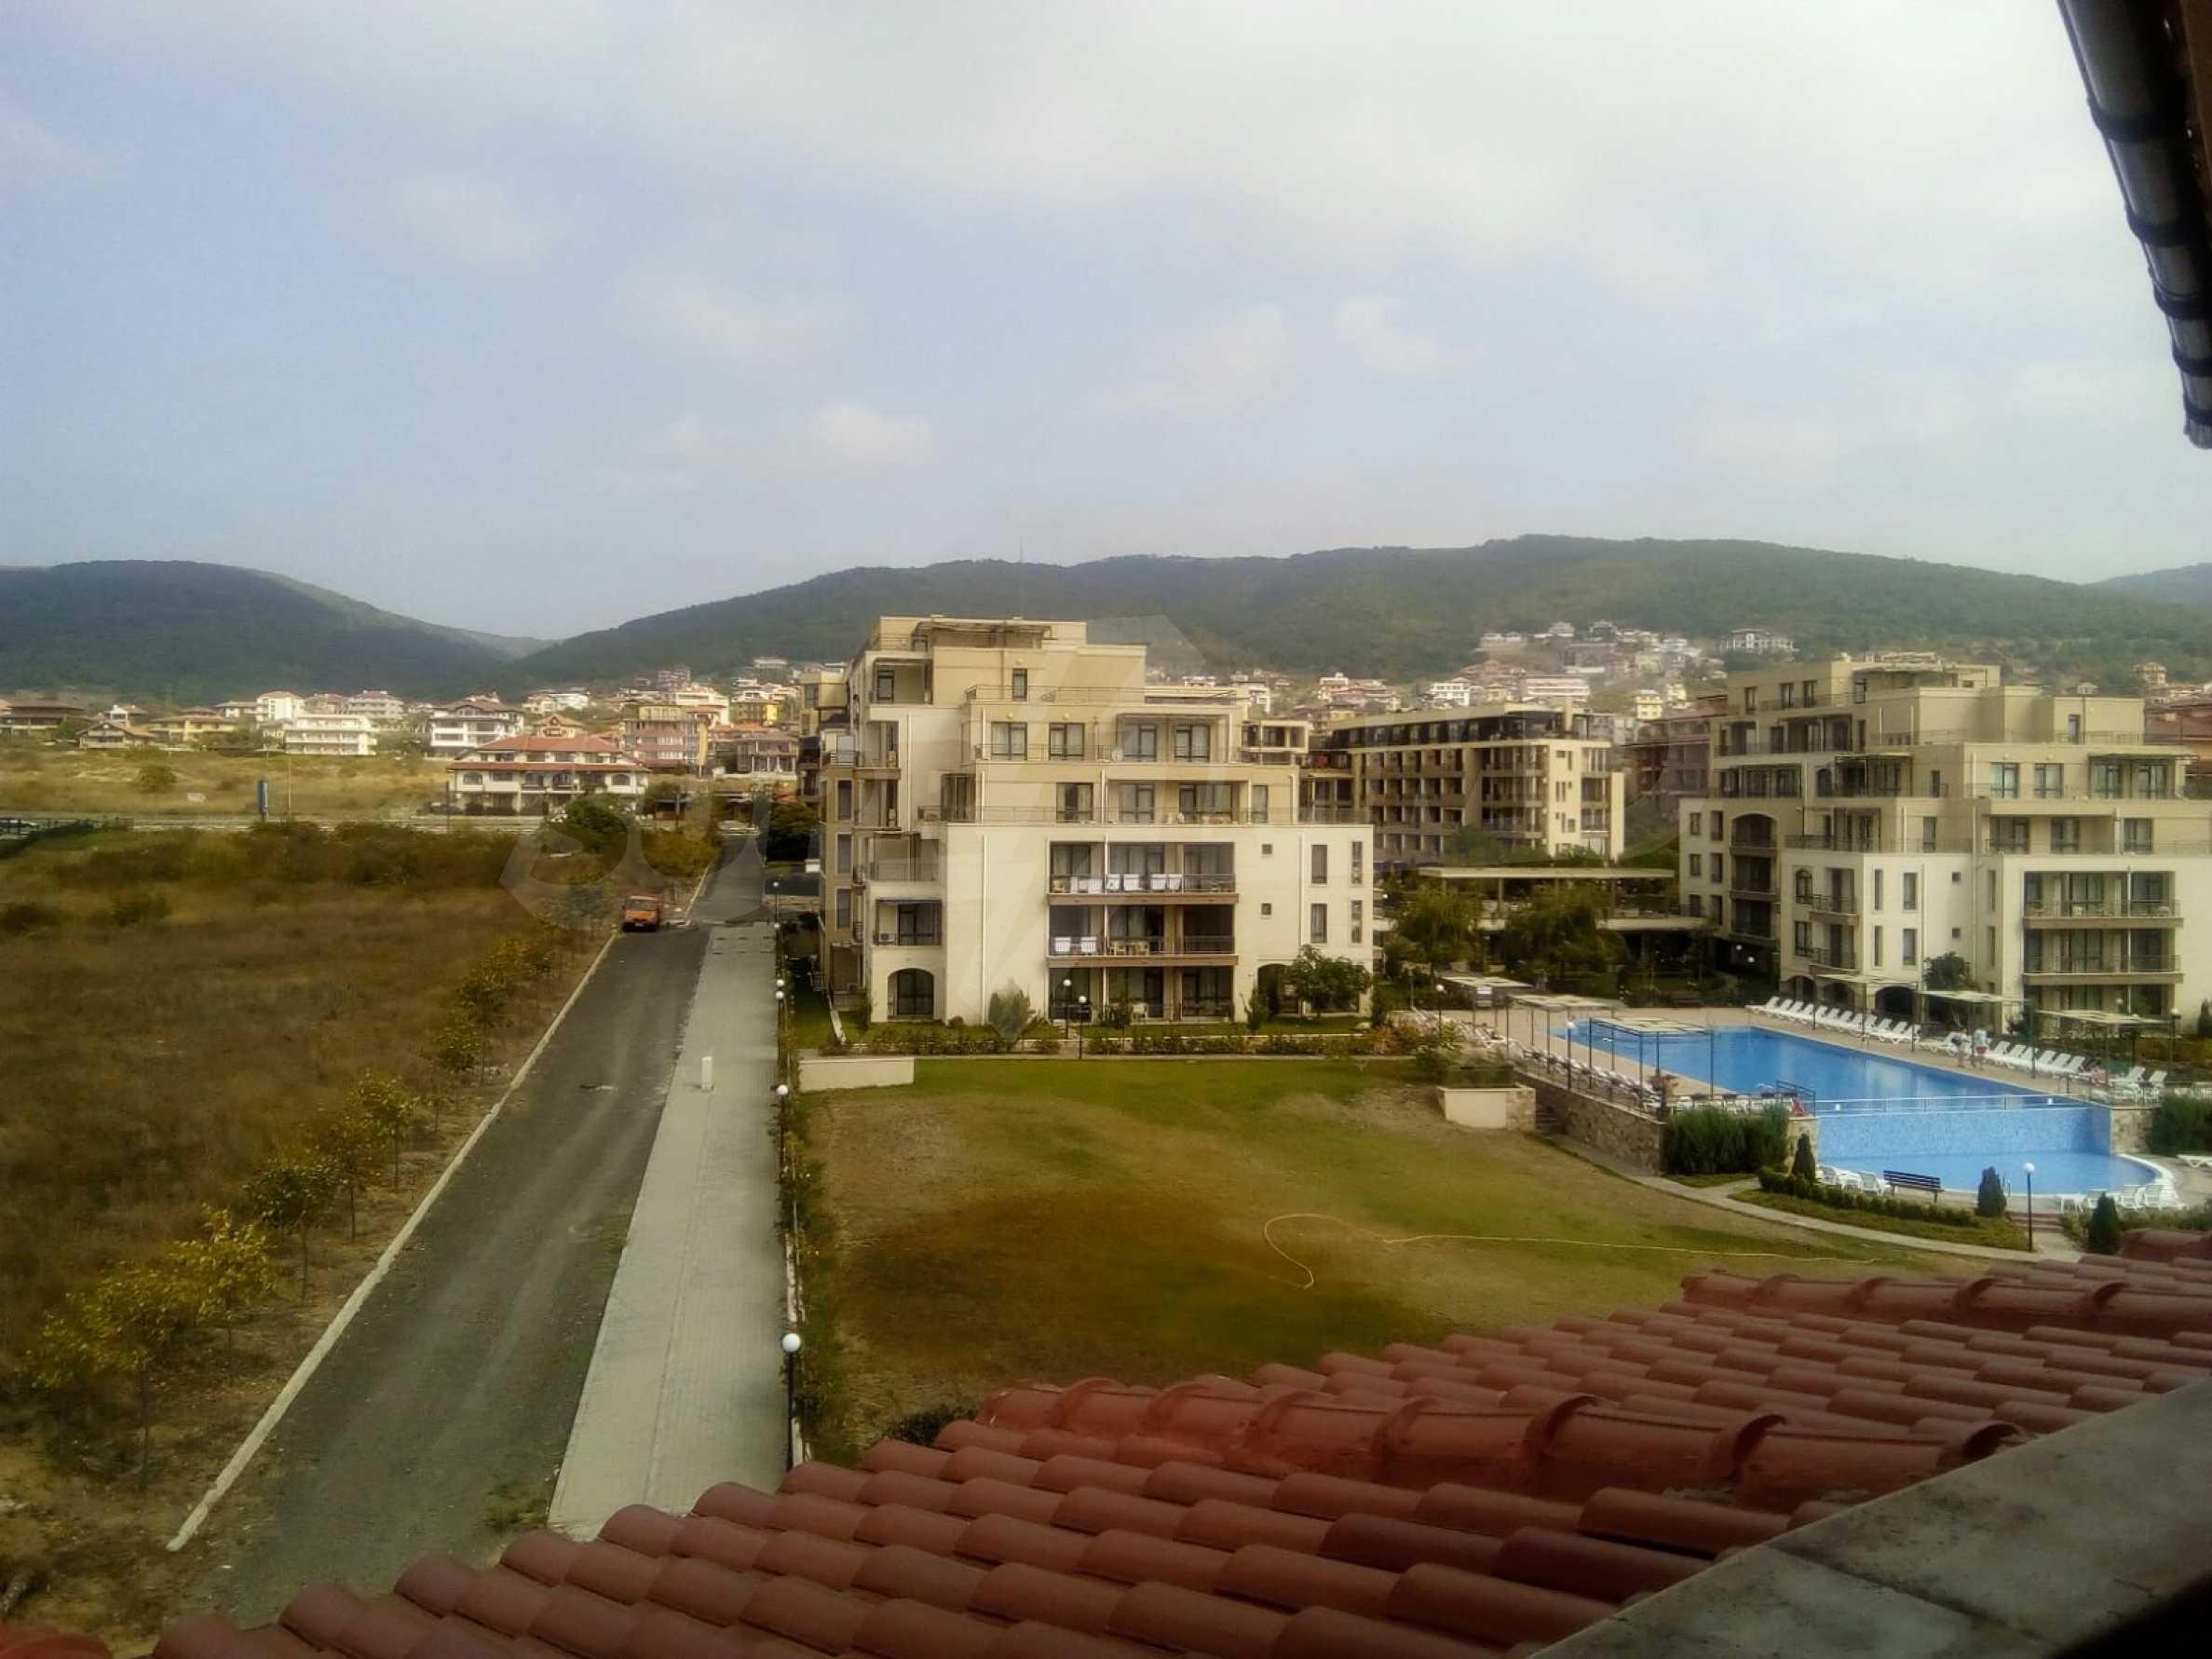 Стилен четиристаен апартамент само на сто метра от плажа, Свети Влас 12